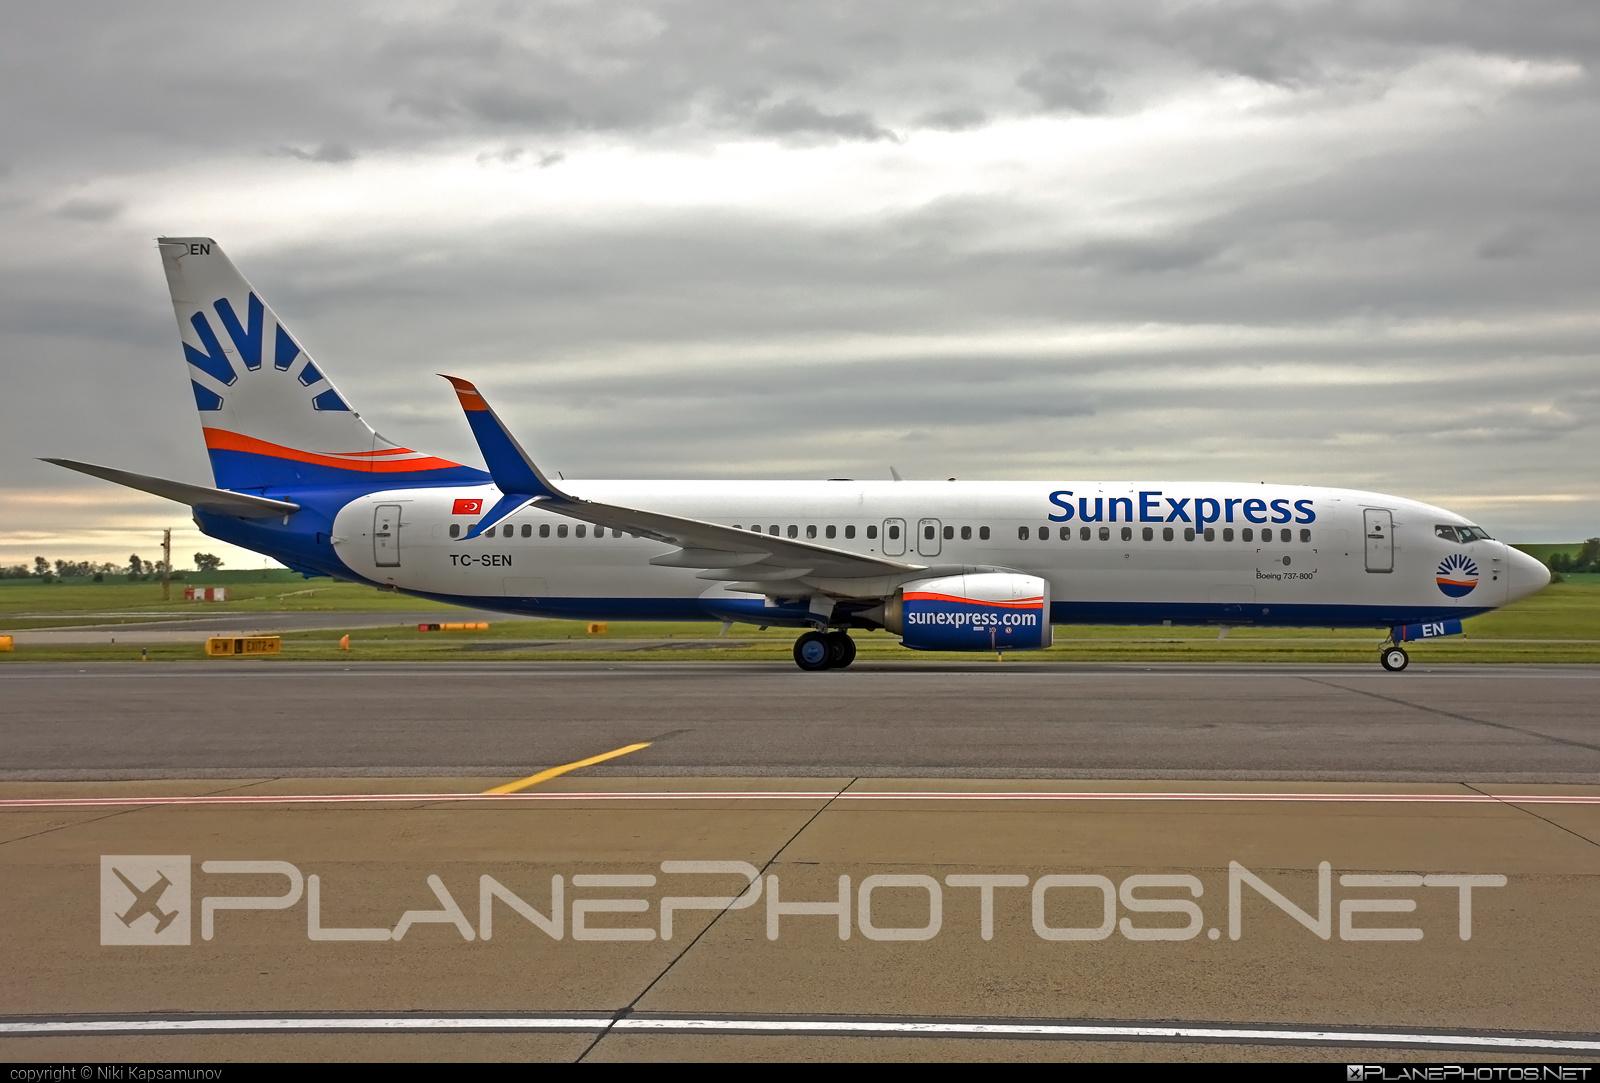 Boeing 737-800 - TC-SEN operated by SunExpress #b737 #b737nextgen #b737ng #boeing #boeing737 #sunexpress